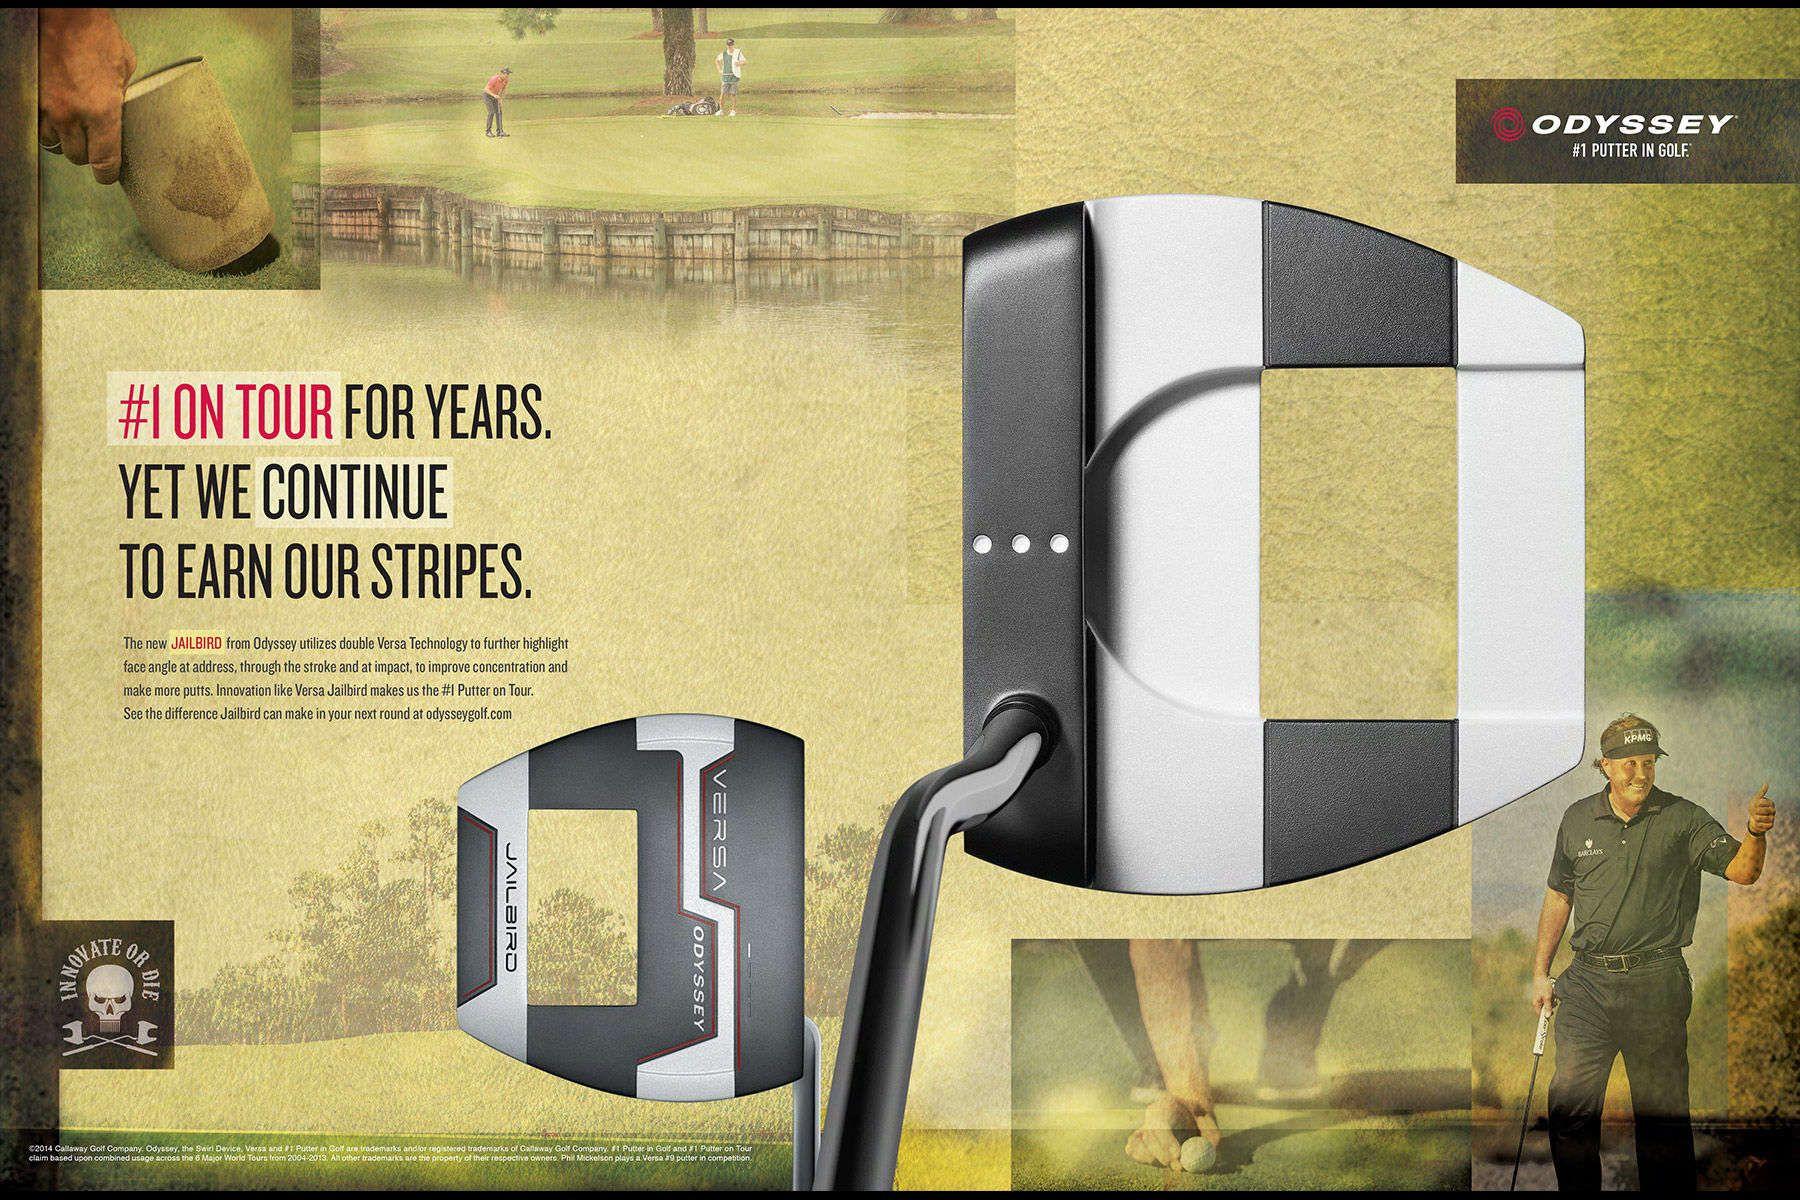 Odyssey Putters/Callaway Golf 2014